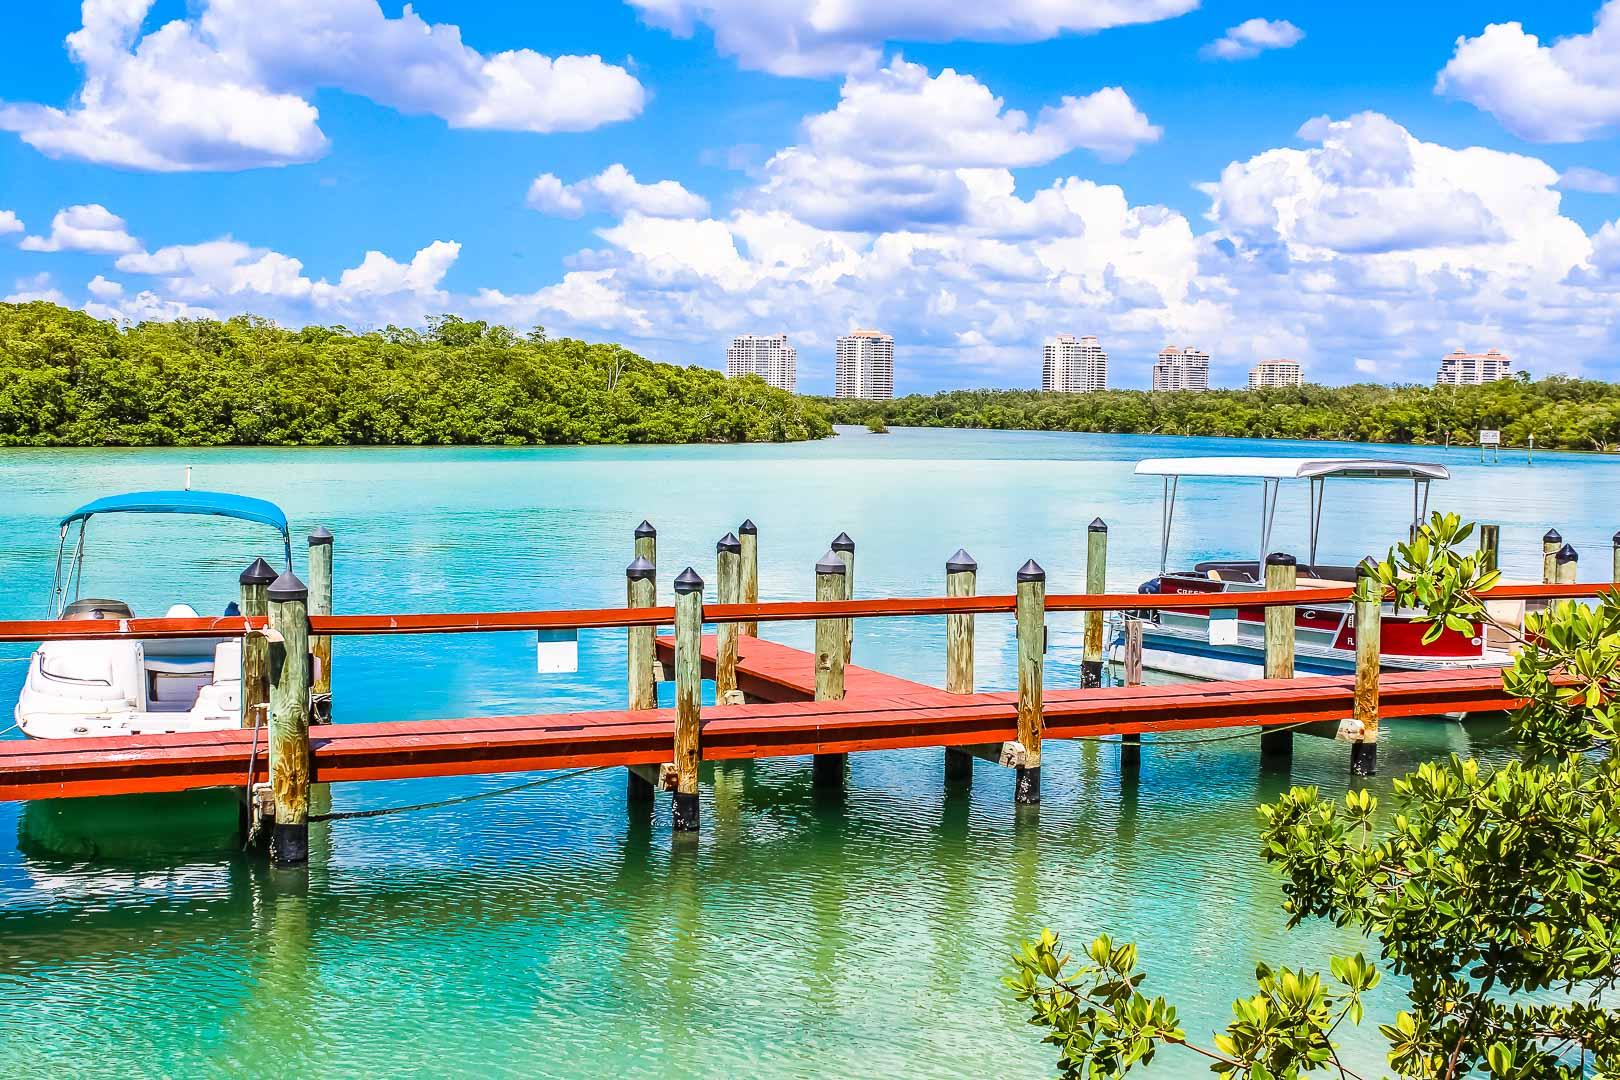 A Boat Dock from VRI's Bonita Resort and Club in Florida.